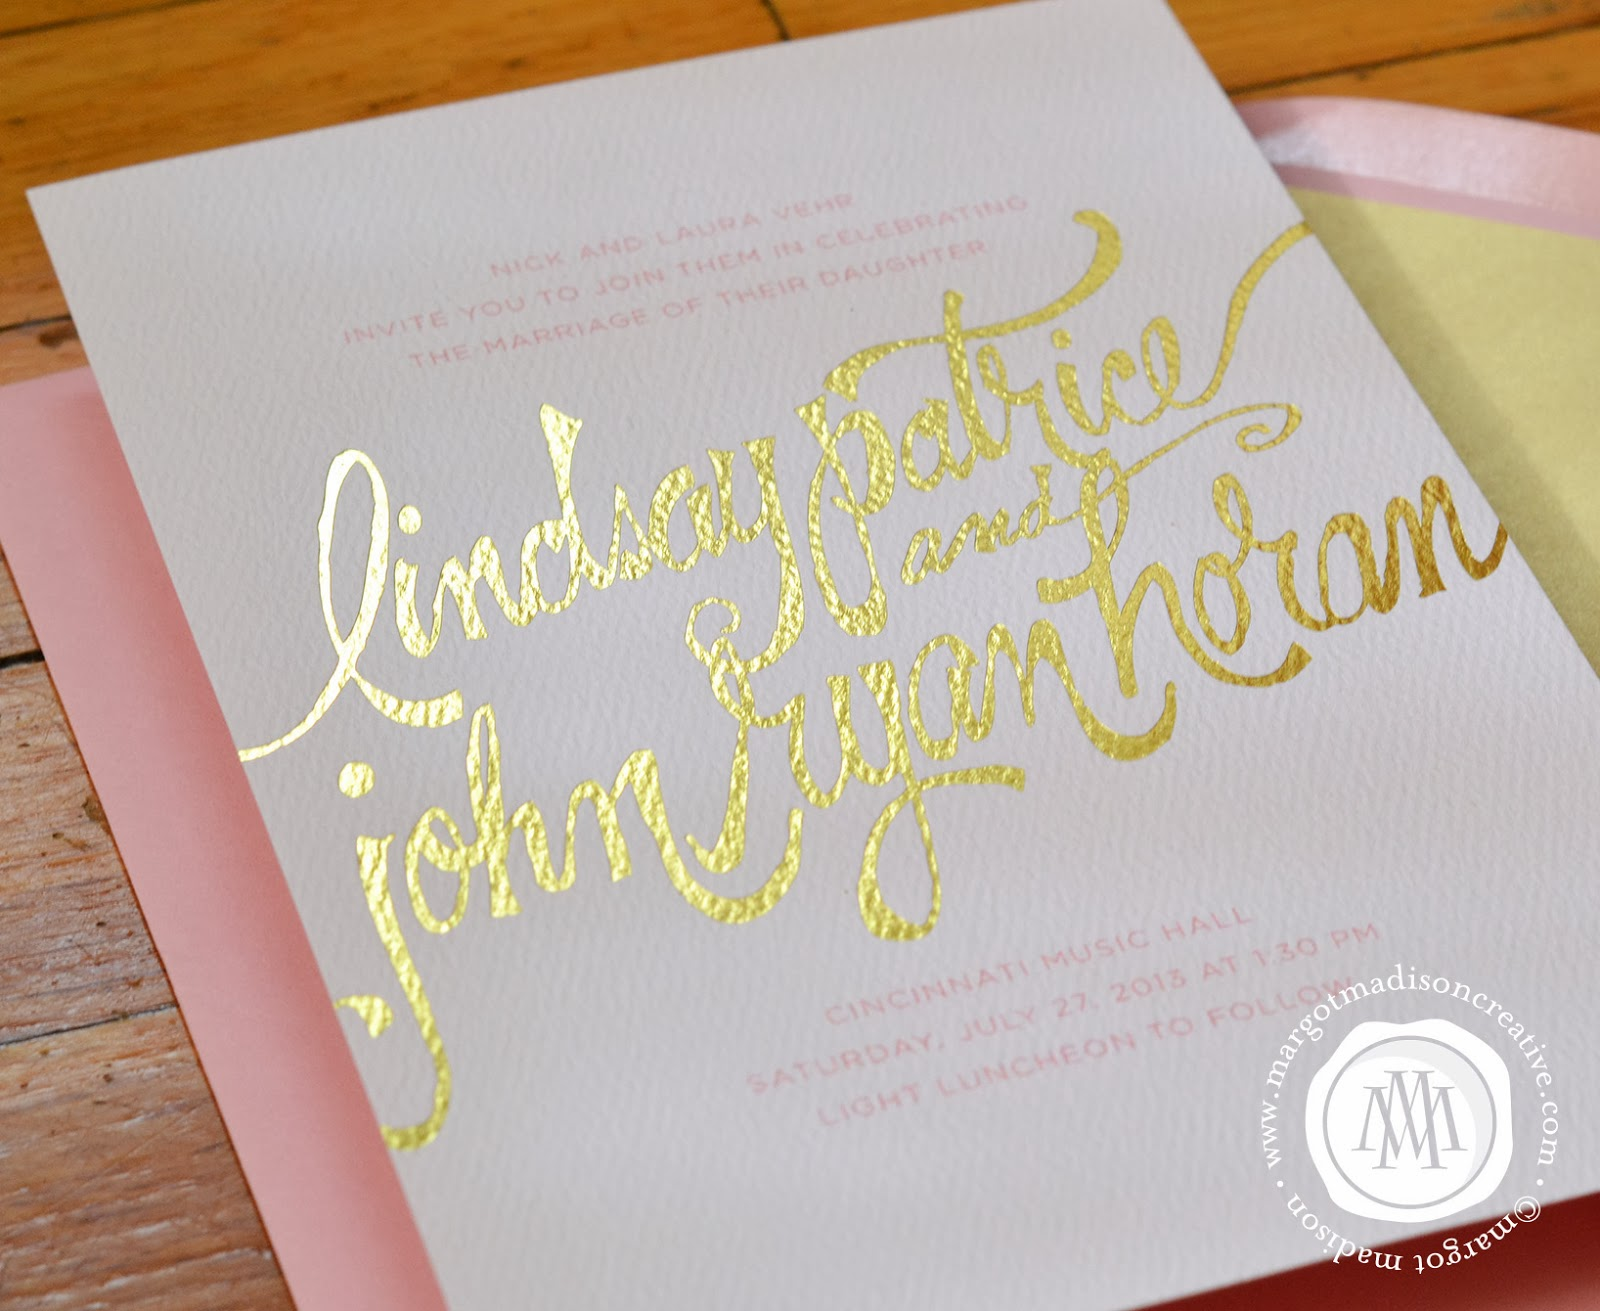 Calligraphy Wedding Invitations: MargotMadison: Wedding Invitation Trends: Handwritten